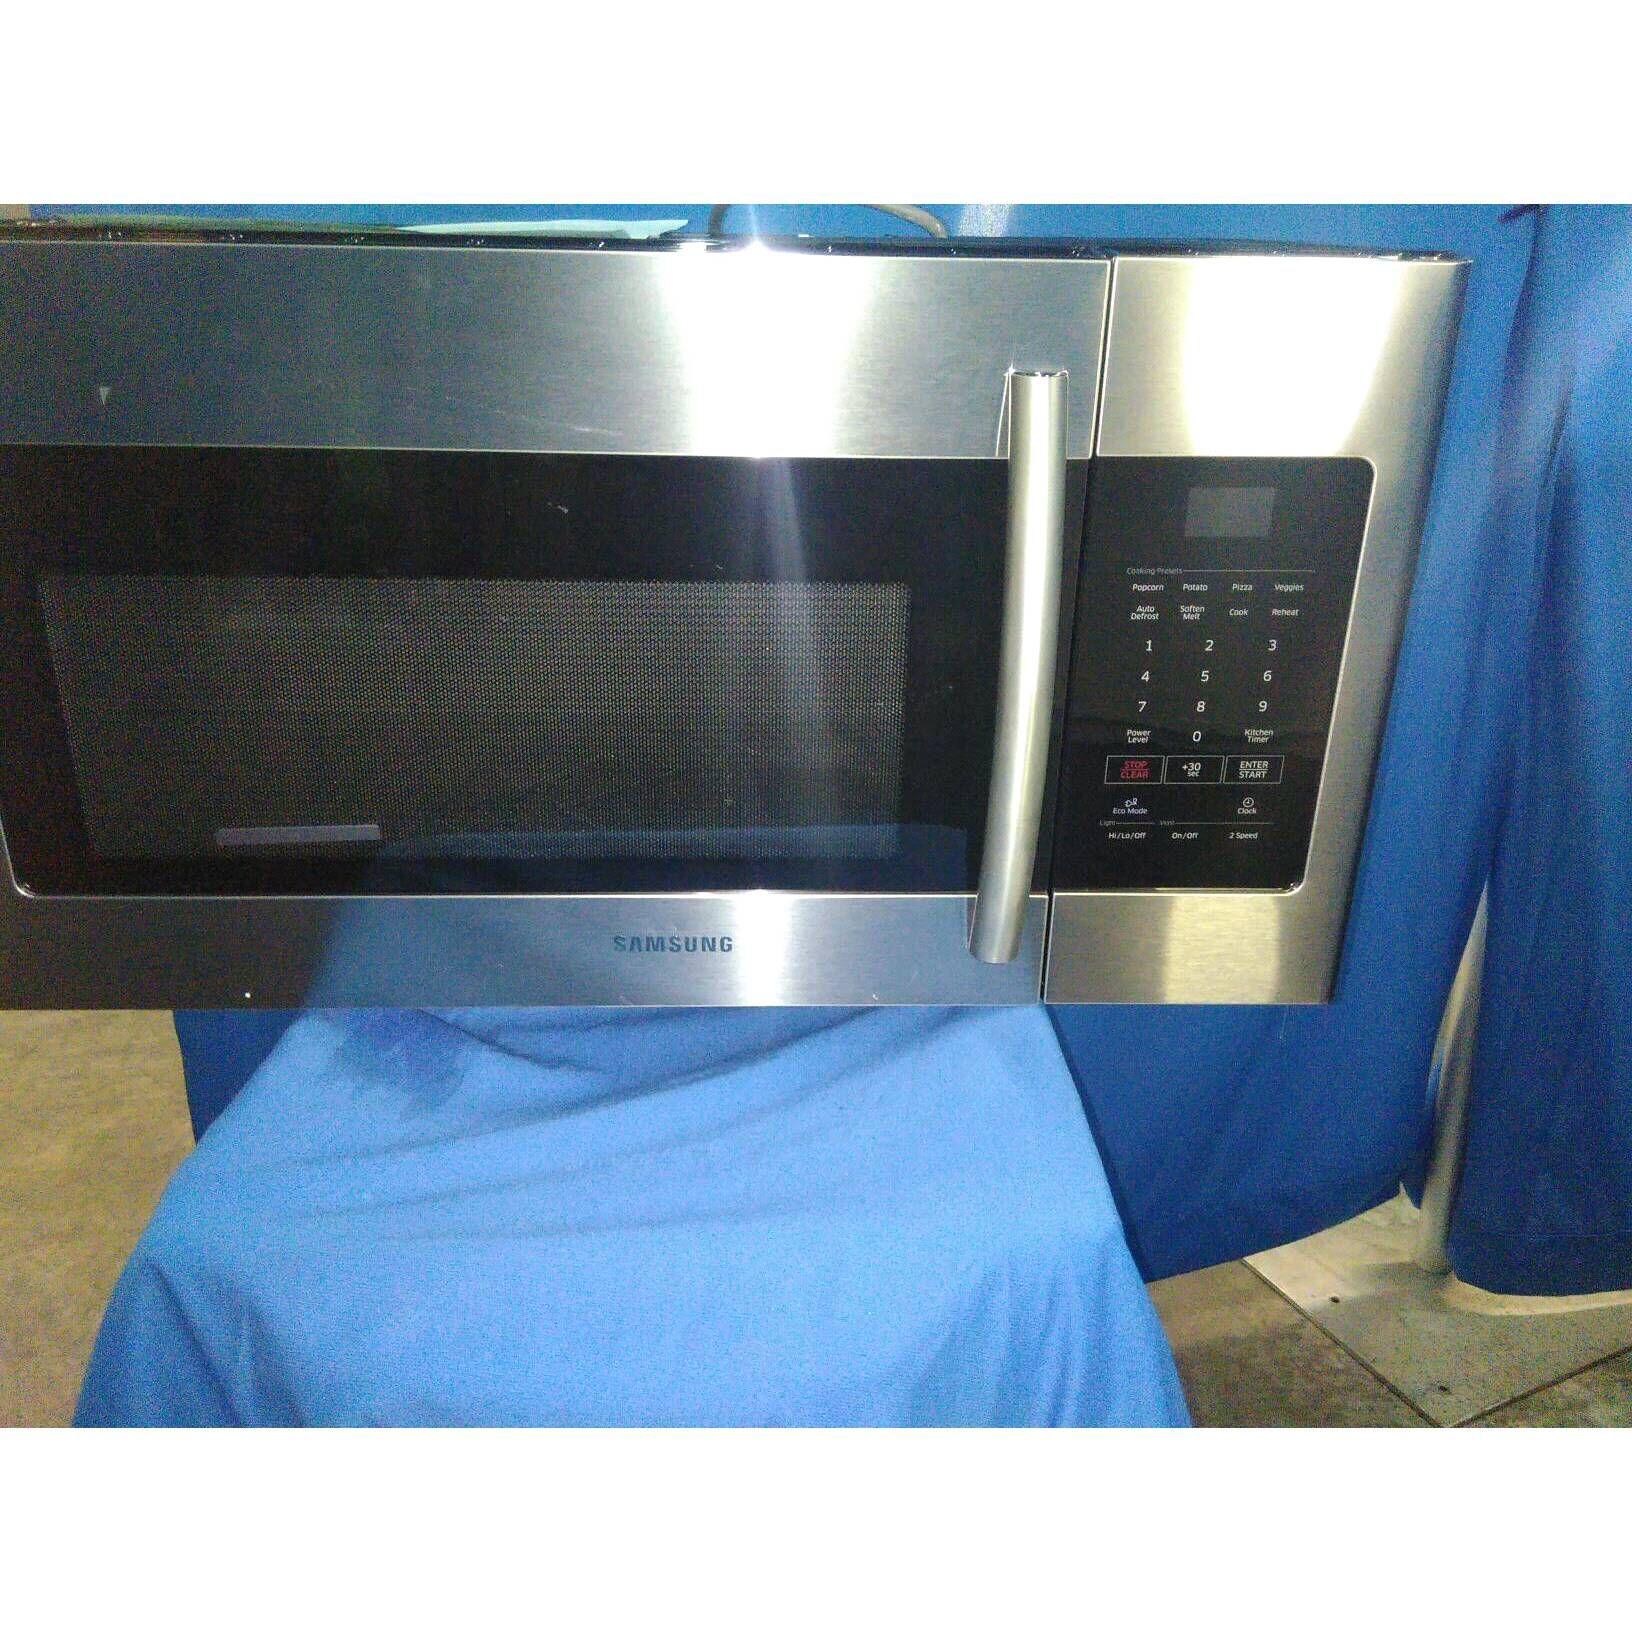 Aa 1 6 Cu Ft Over The Range Microwave